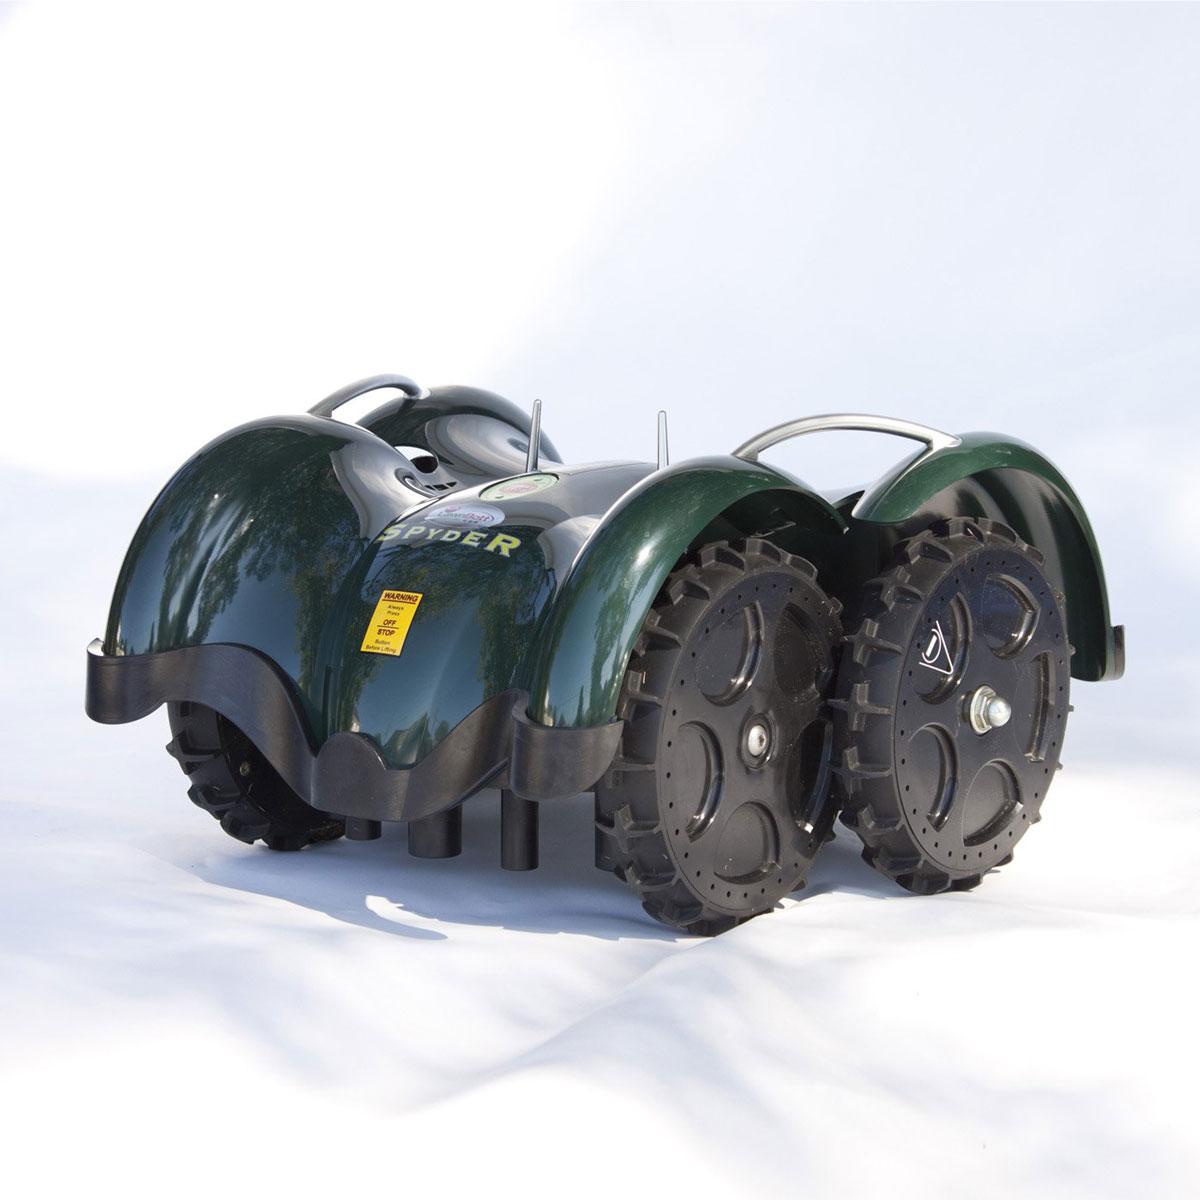 RoboMower RL1000 Robotic Lawn Mower w/ Docking Station ...